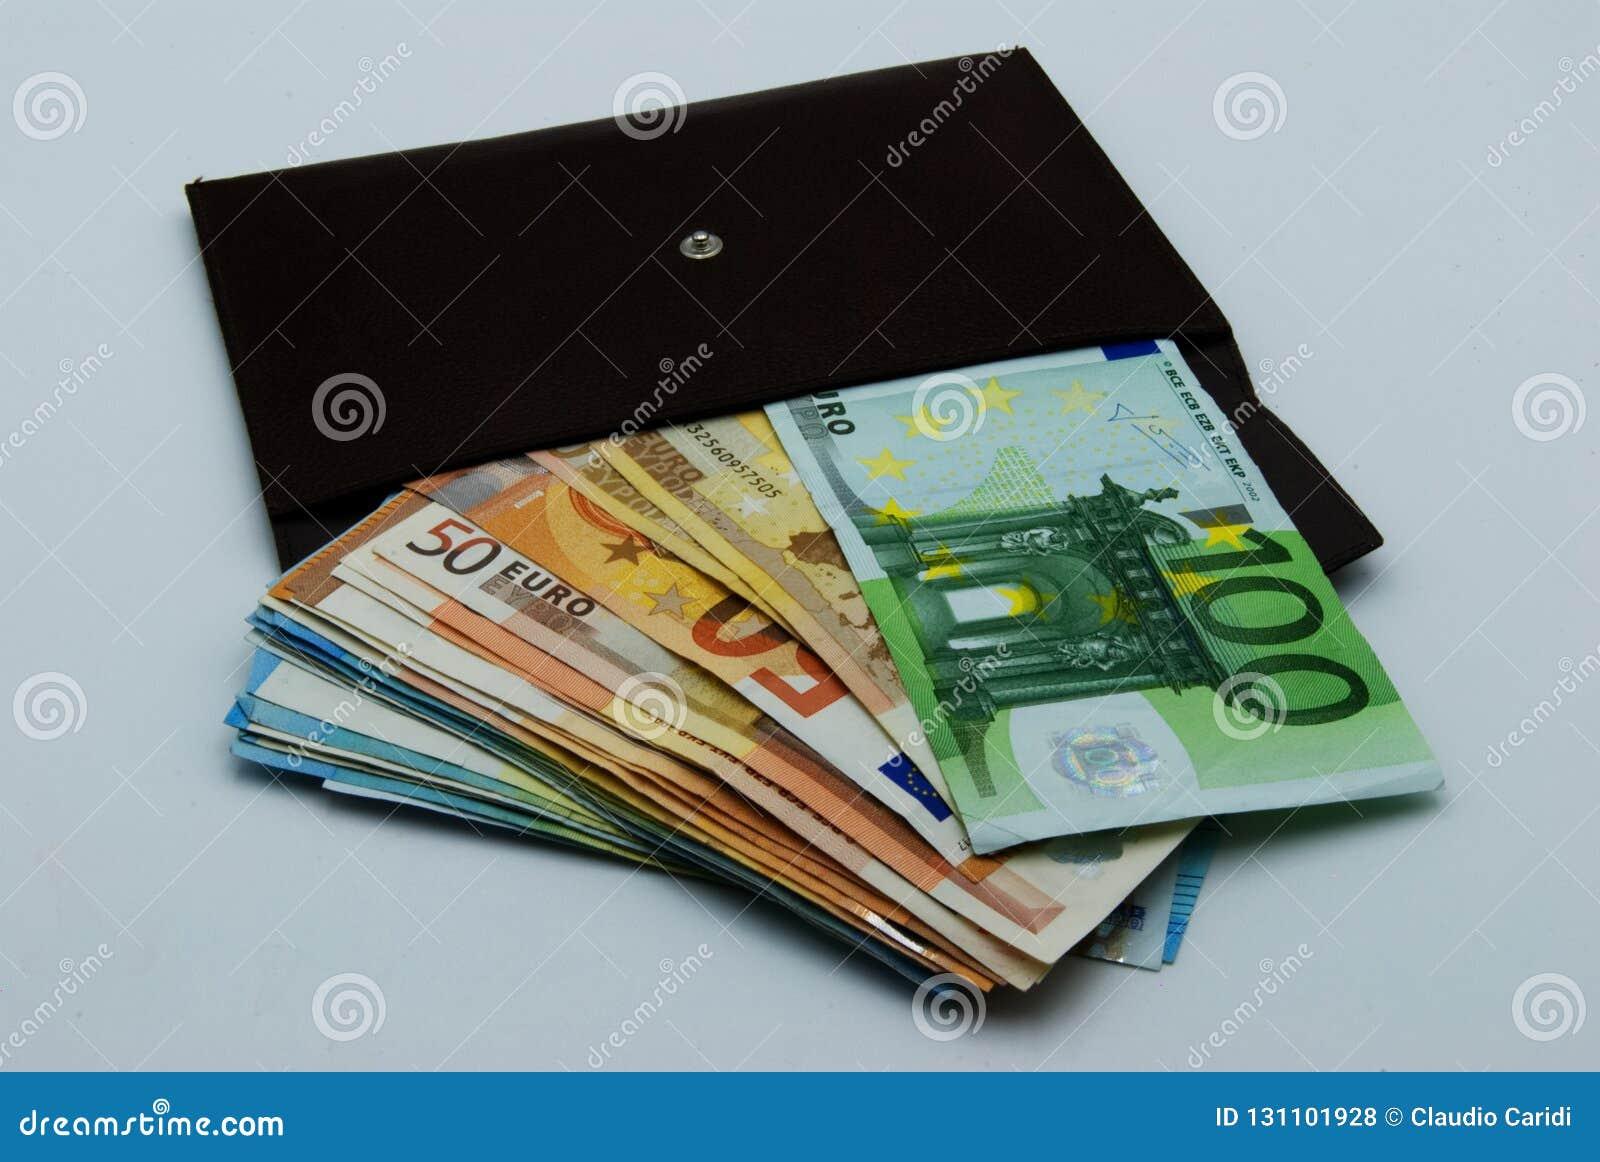 A wallet full of cash money